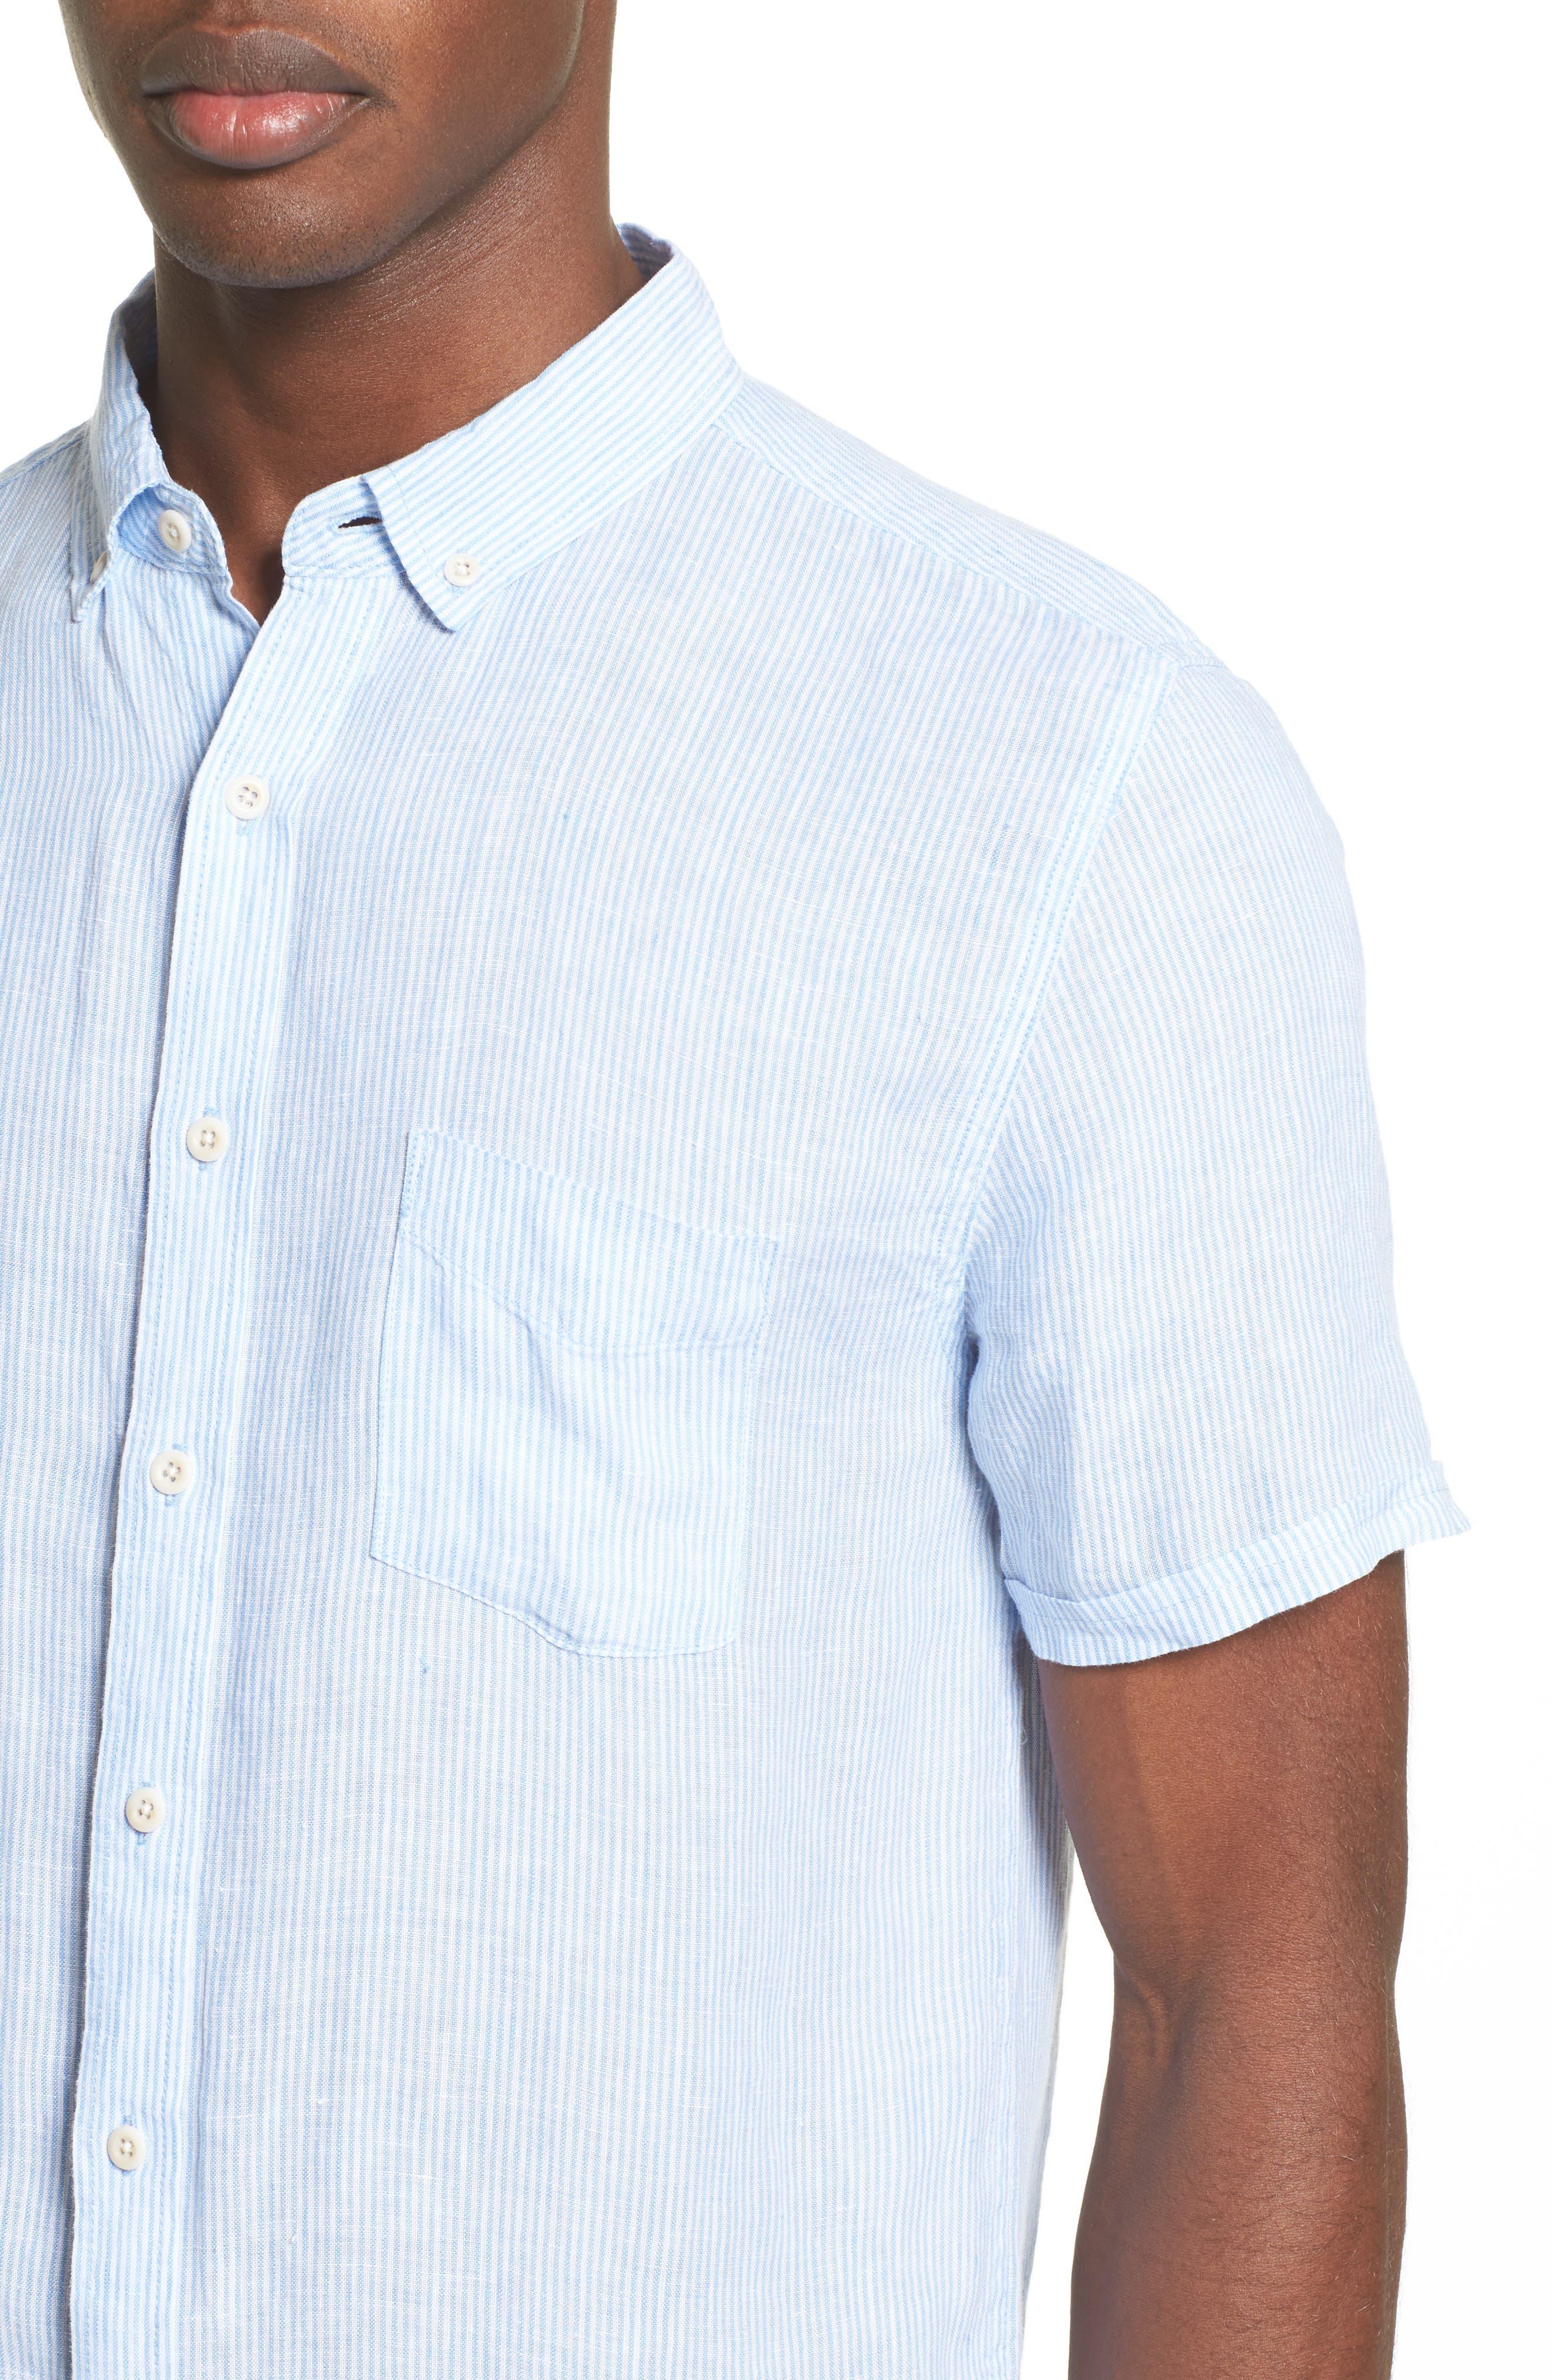 Trim Fit Microstripe Linen Shirt,                             Alternate thumbnail 10, color,